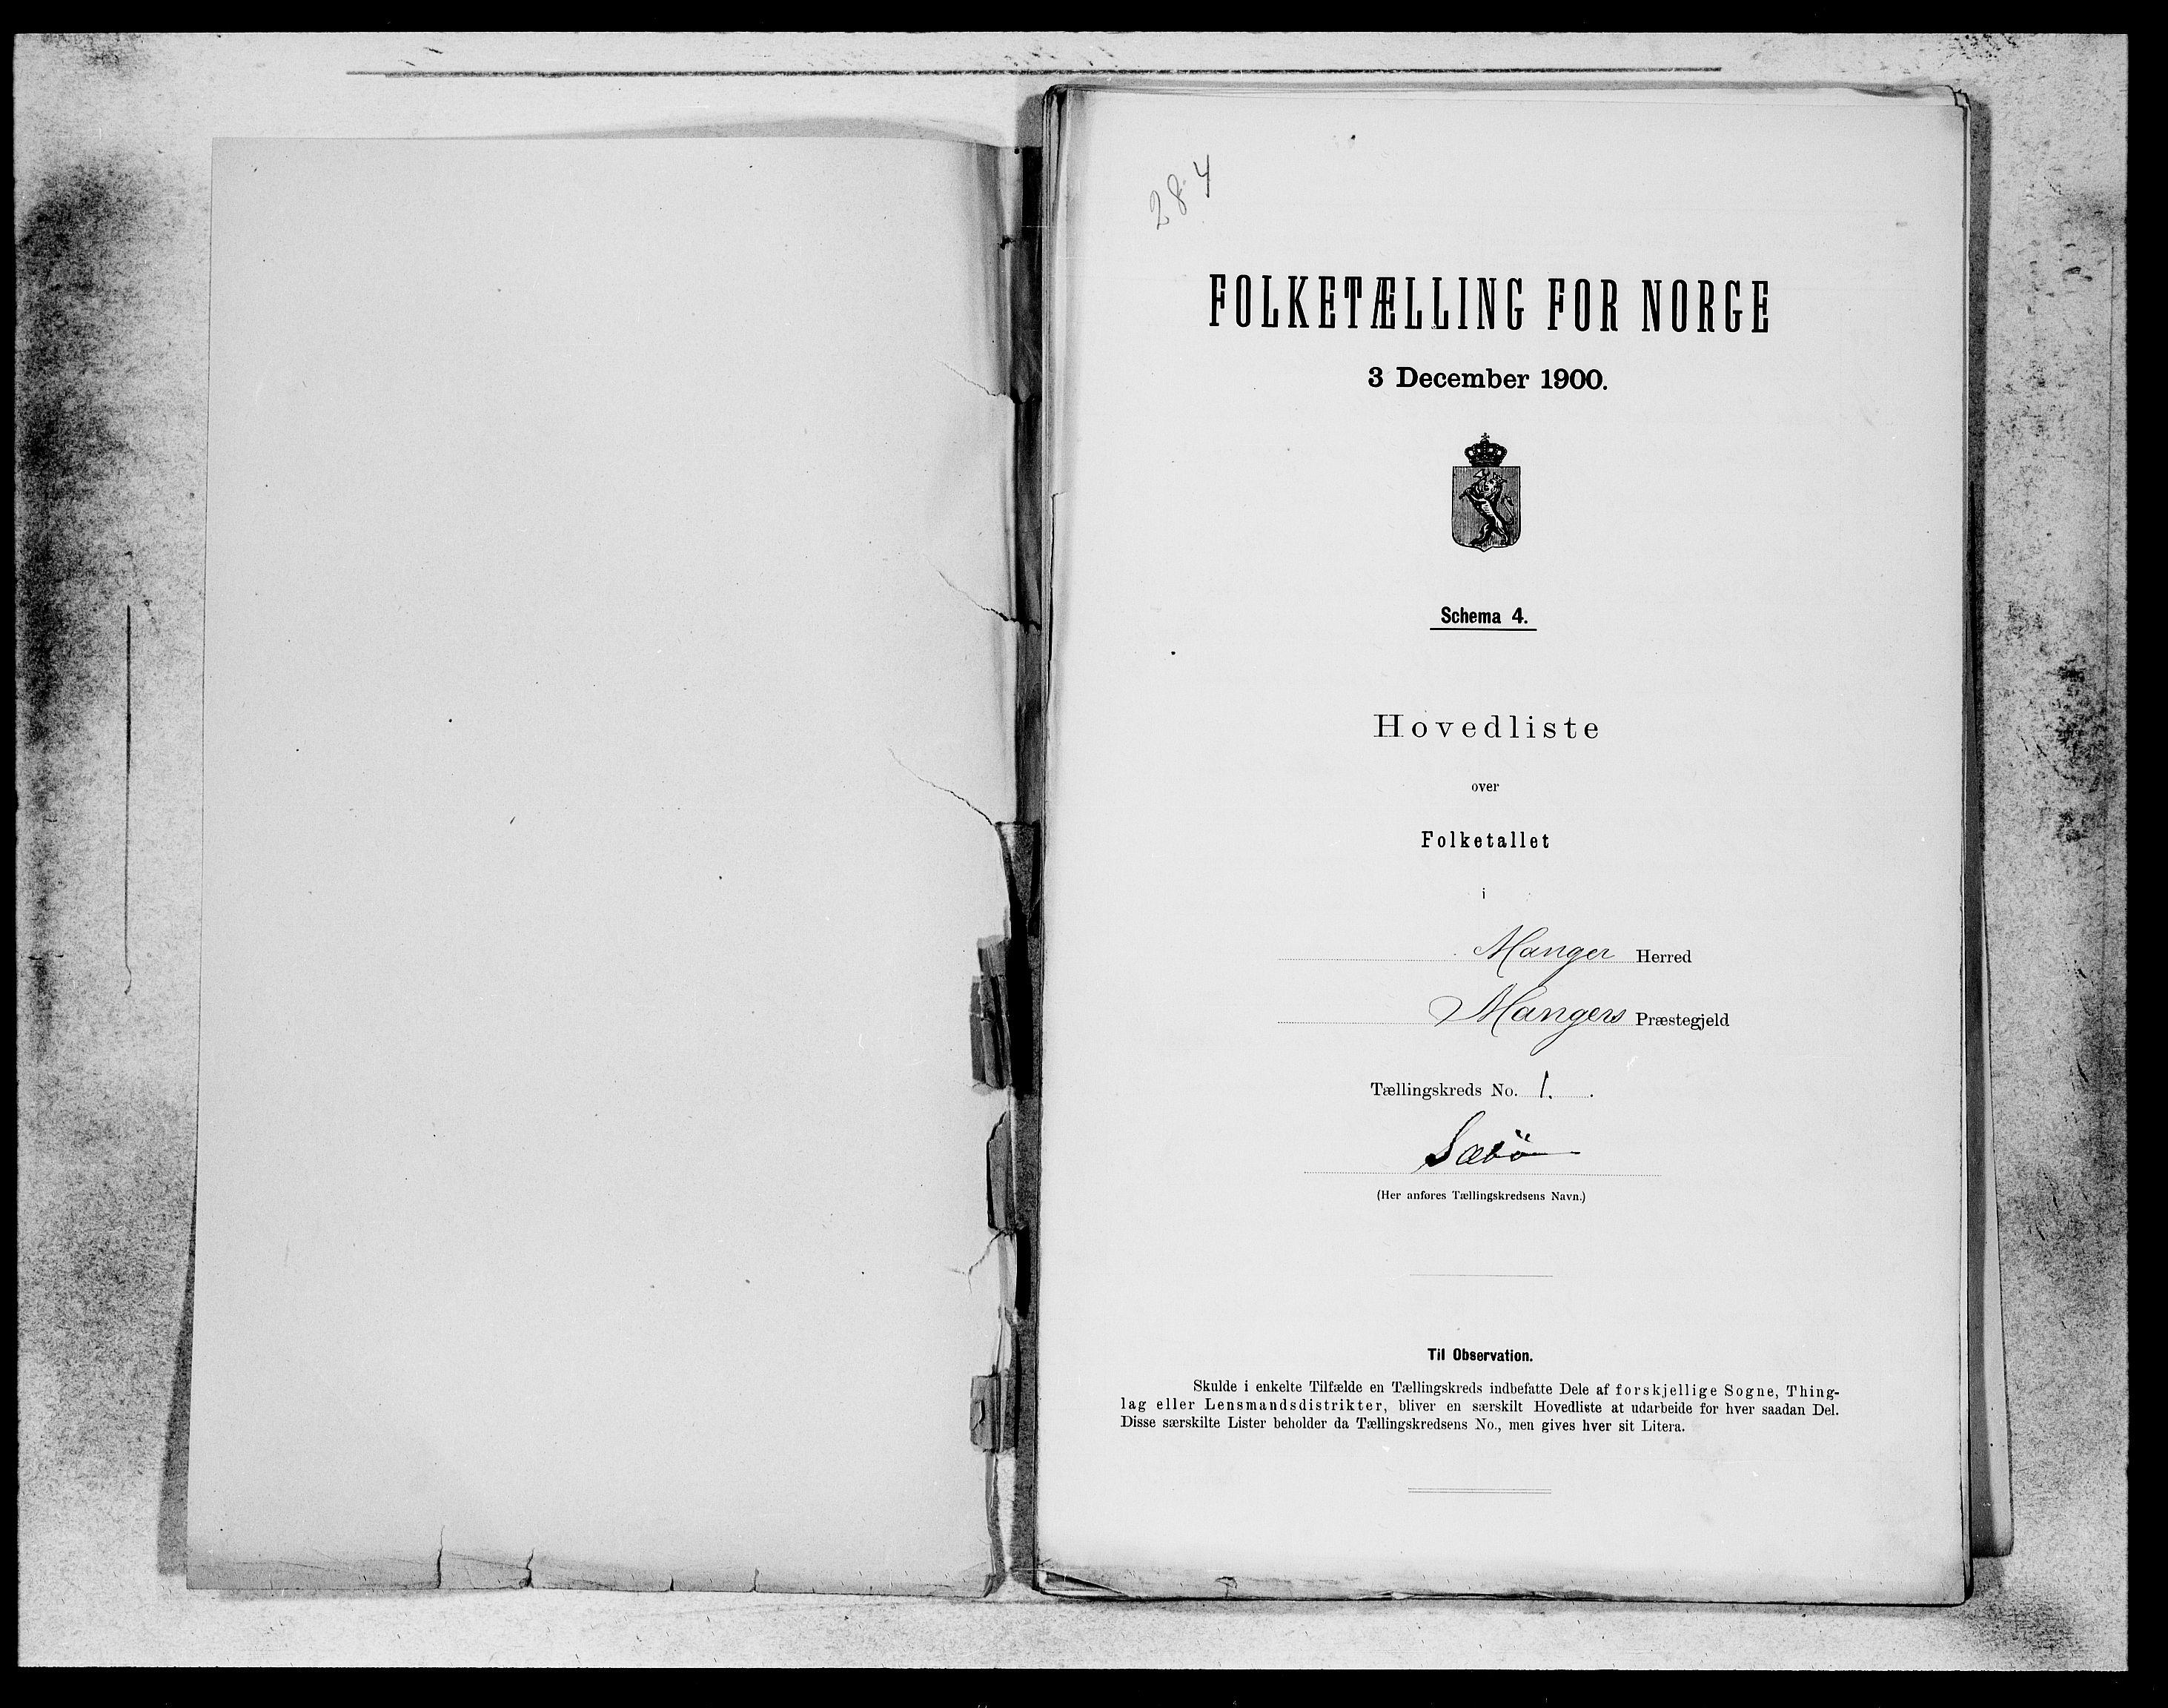 SAB, 1900 census for Manger, 1900, p. 1